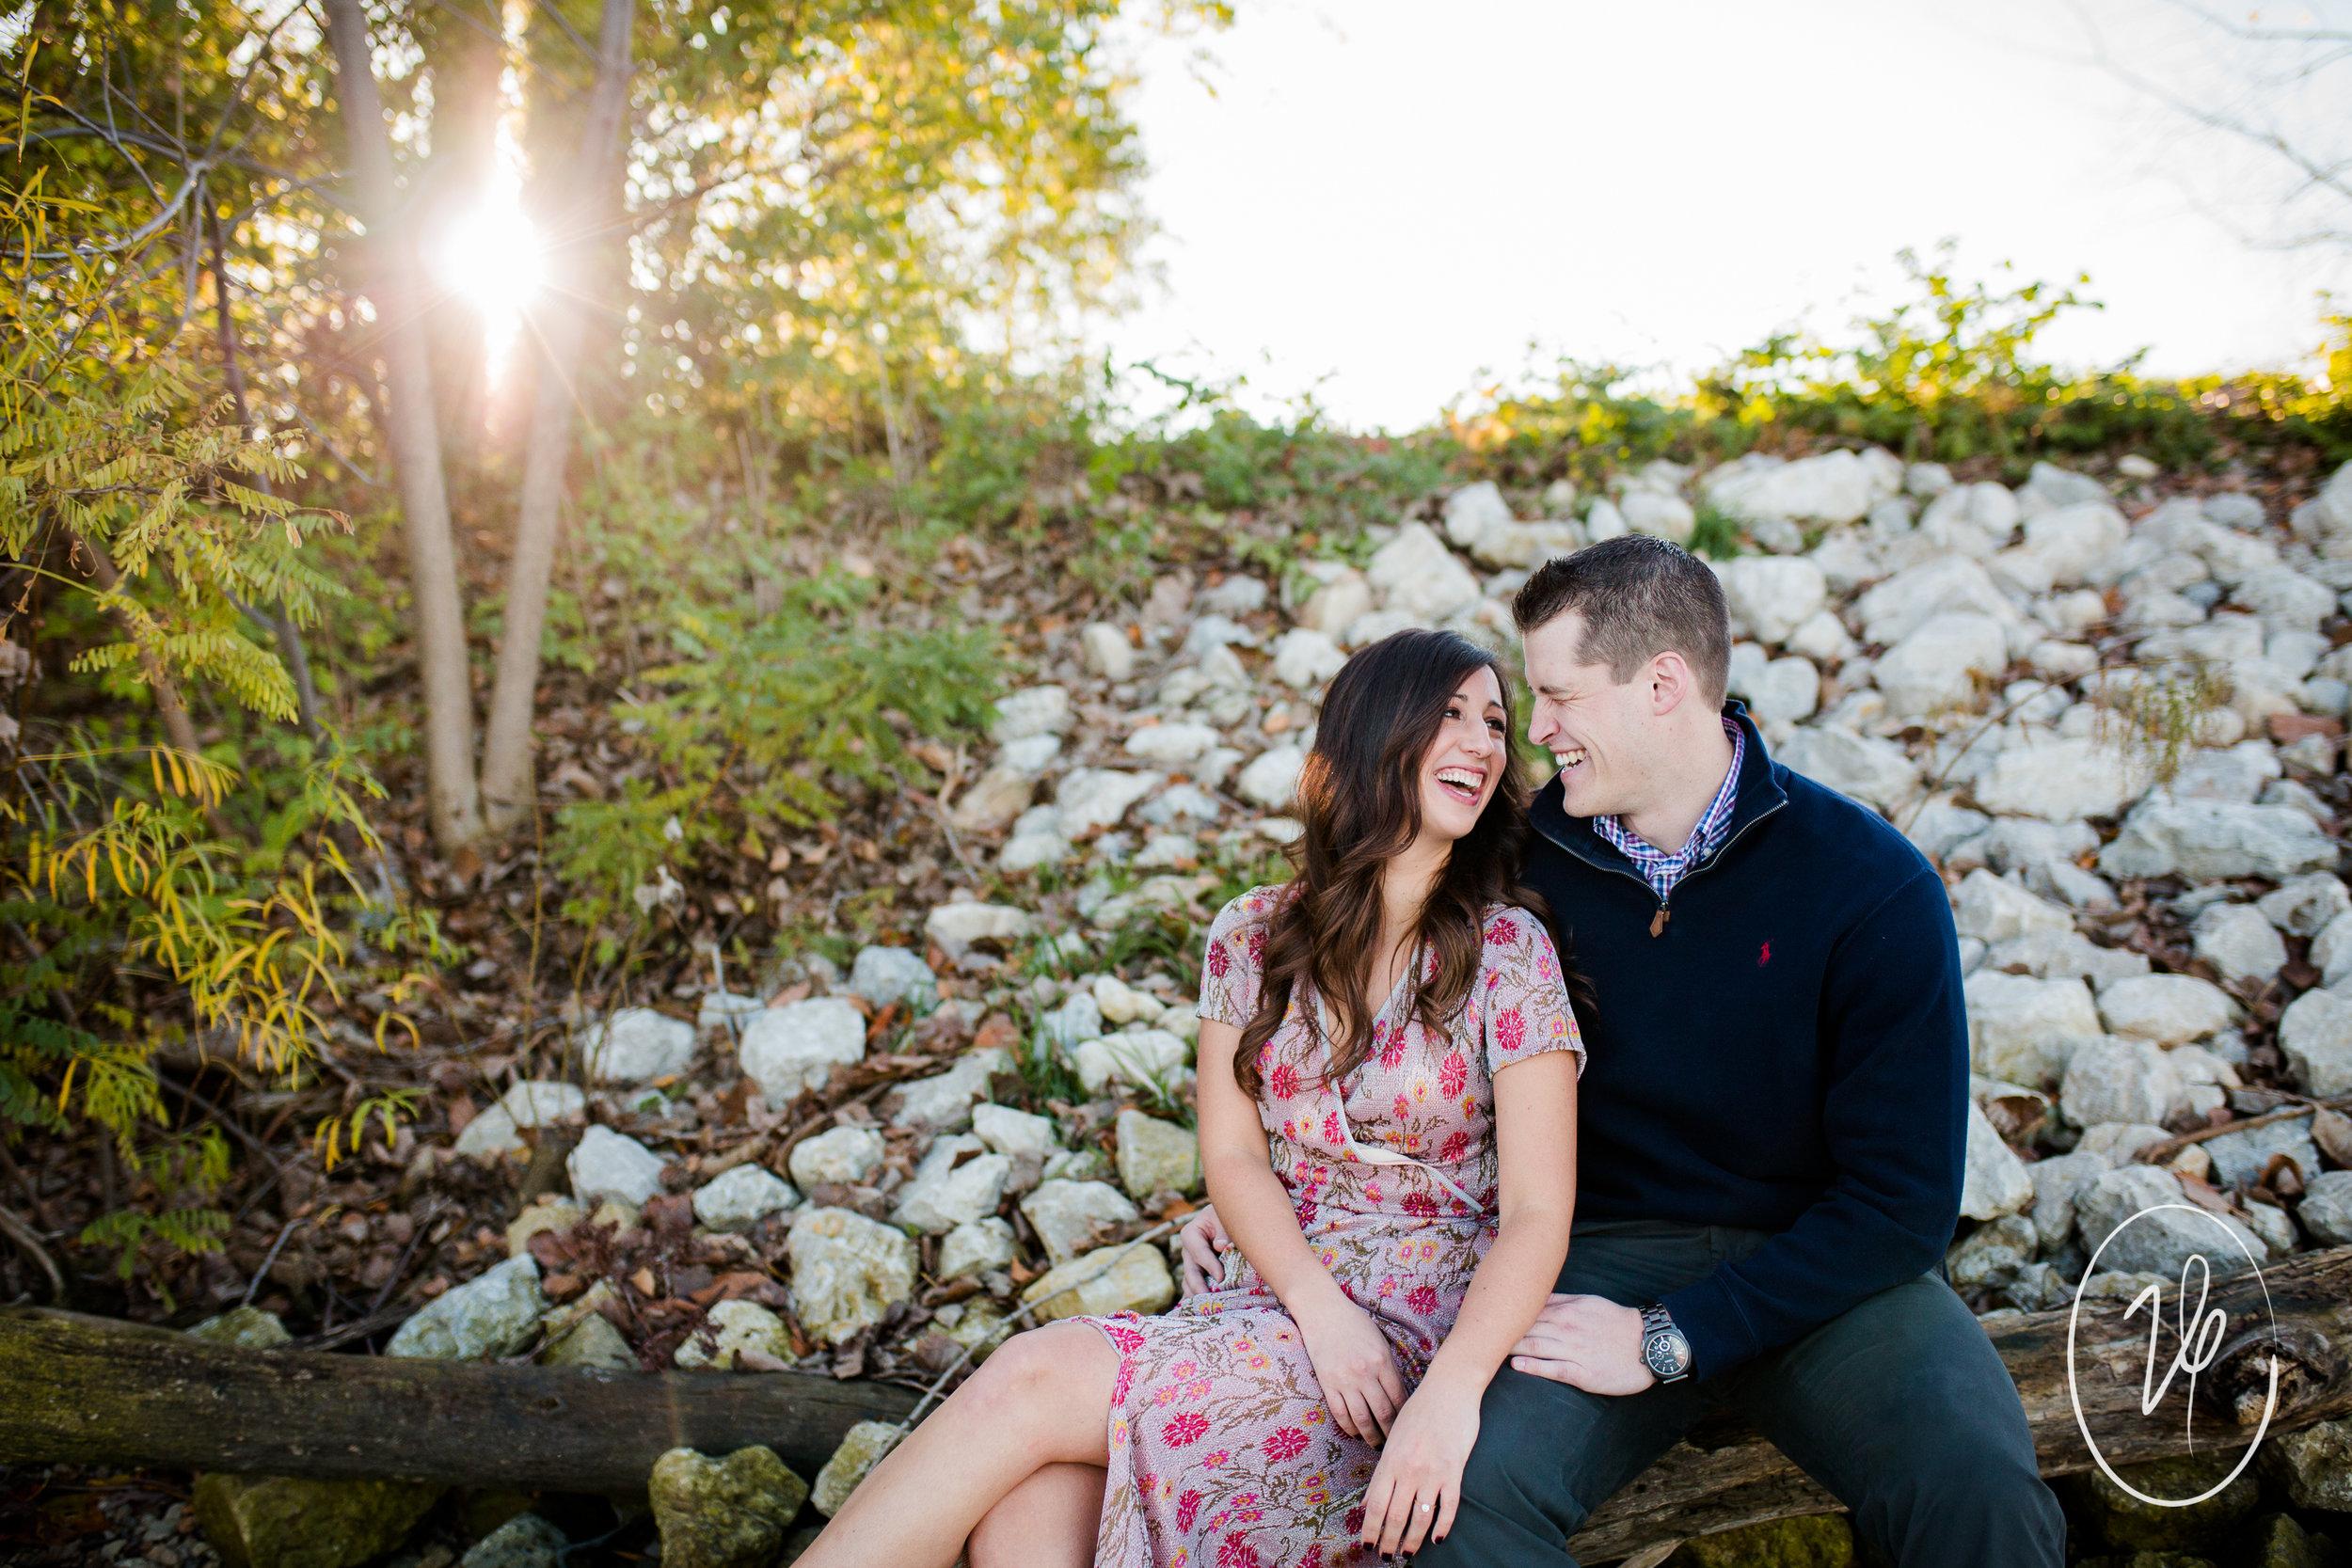 Viridian Ivy Images | Downtown Toledo Engagement Session | Toledo Wedding Photographer